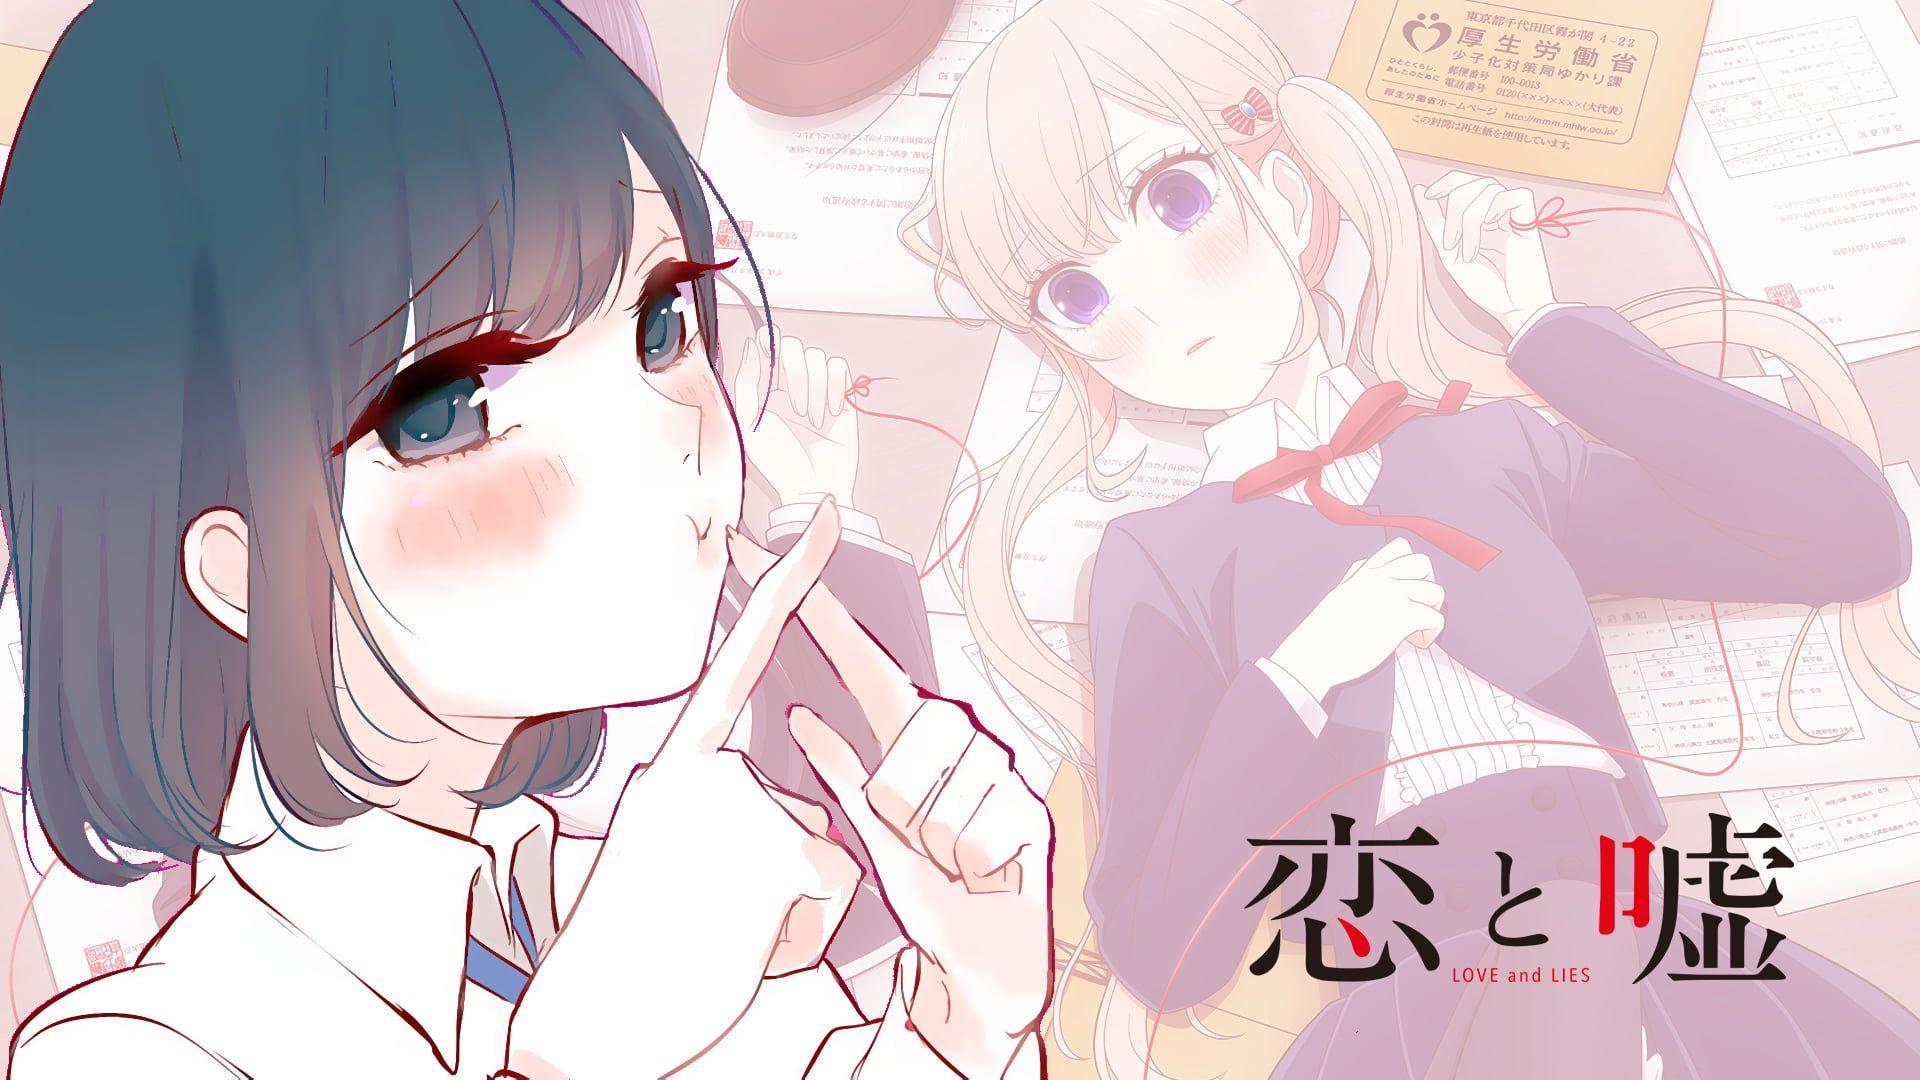 Anime Love And Lies Koi To Uso Lilina Sanada Misaki Takasaki 1080p Wallpaper Hdwallpaper Desktop Anime Cherry Blossoms Illustration Anime Wallpaper